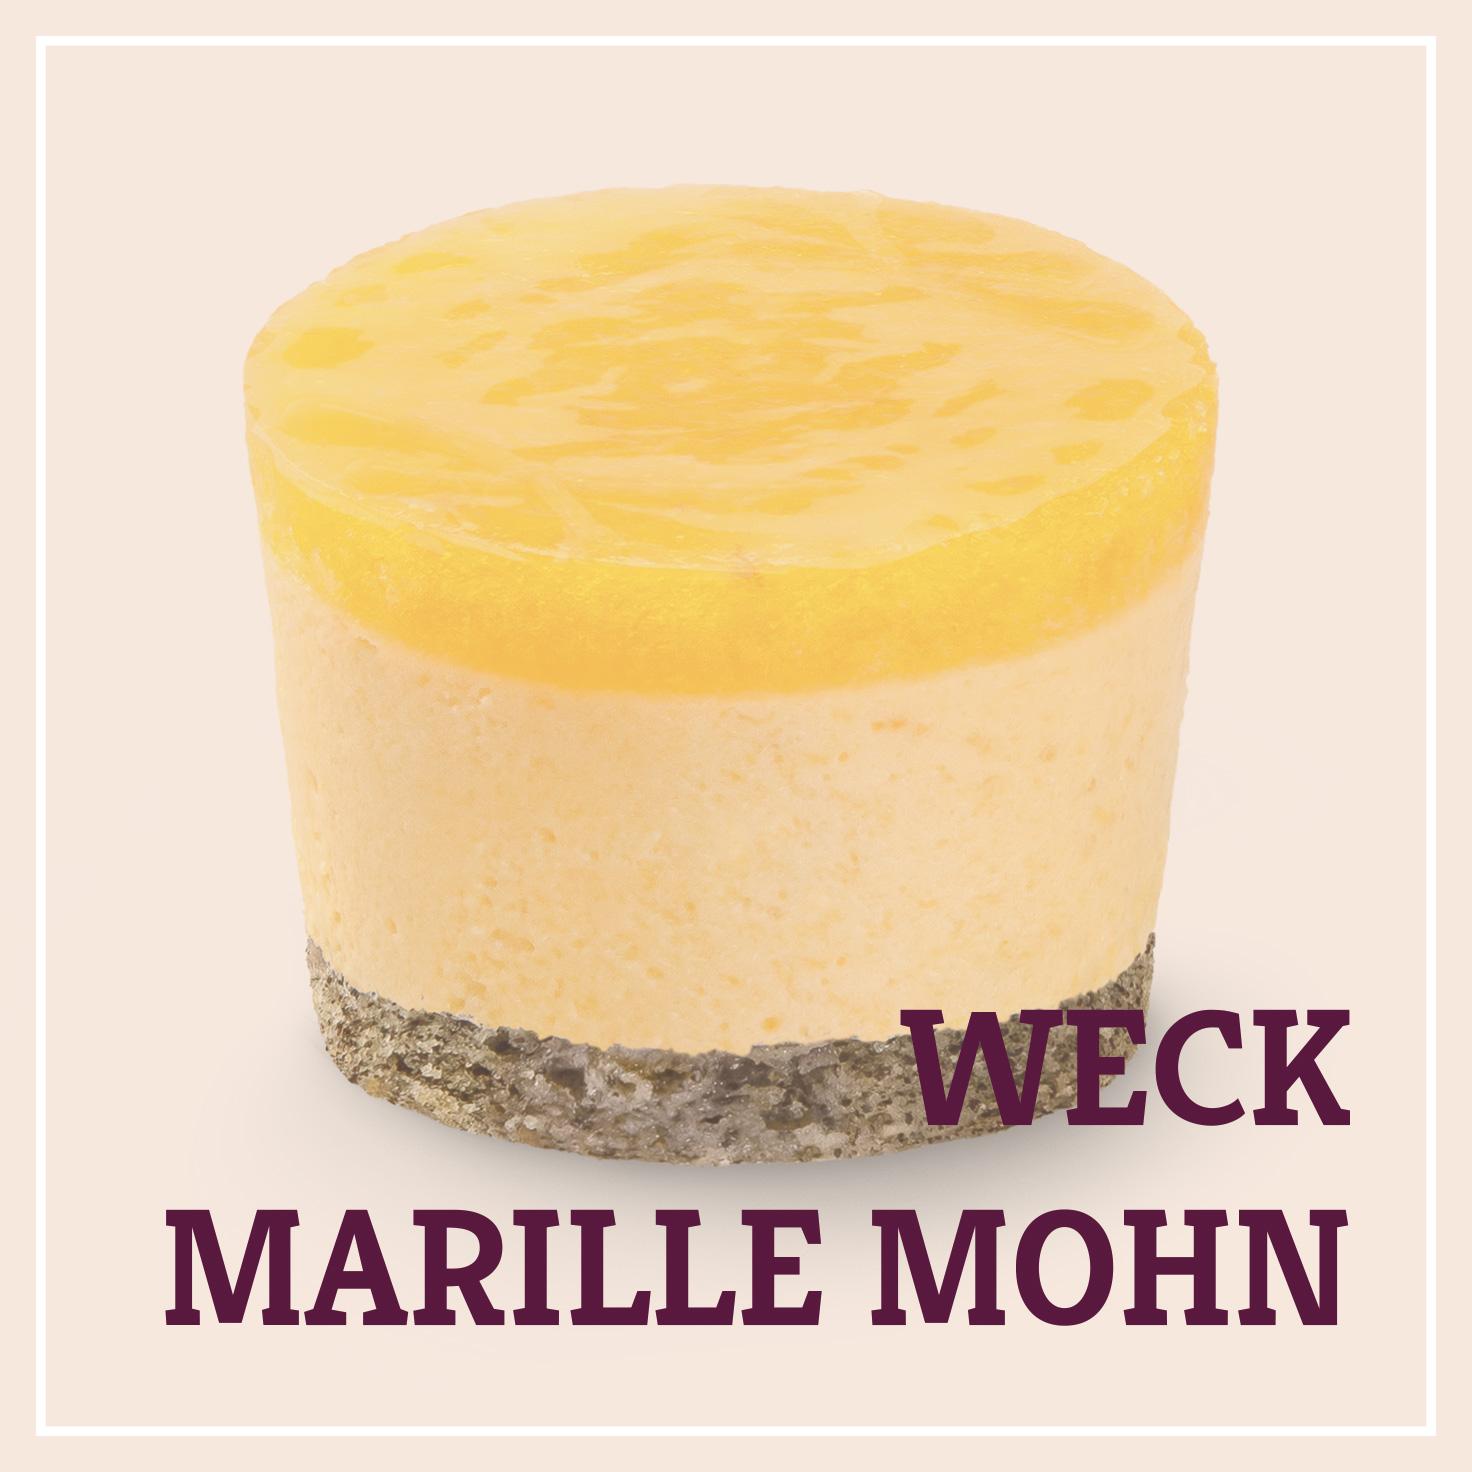 Heiss & Süß - Weck-Marille Mohn